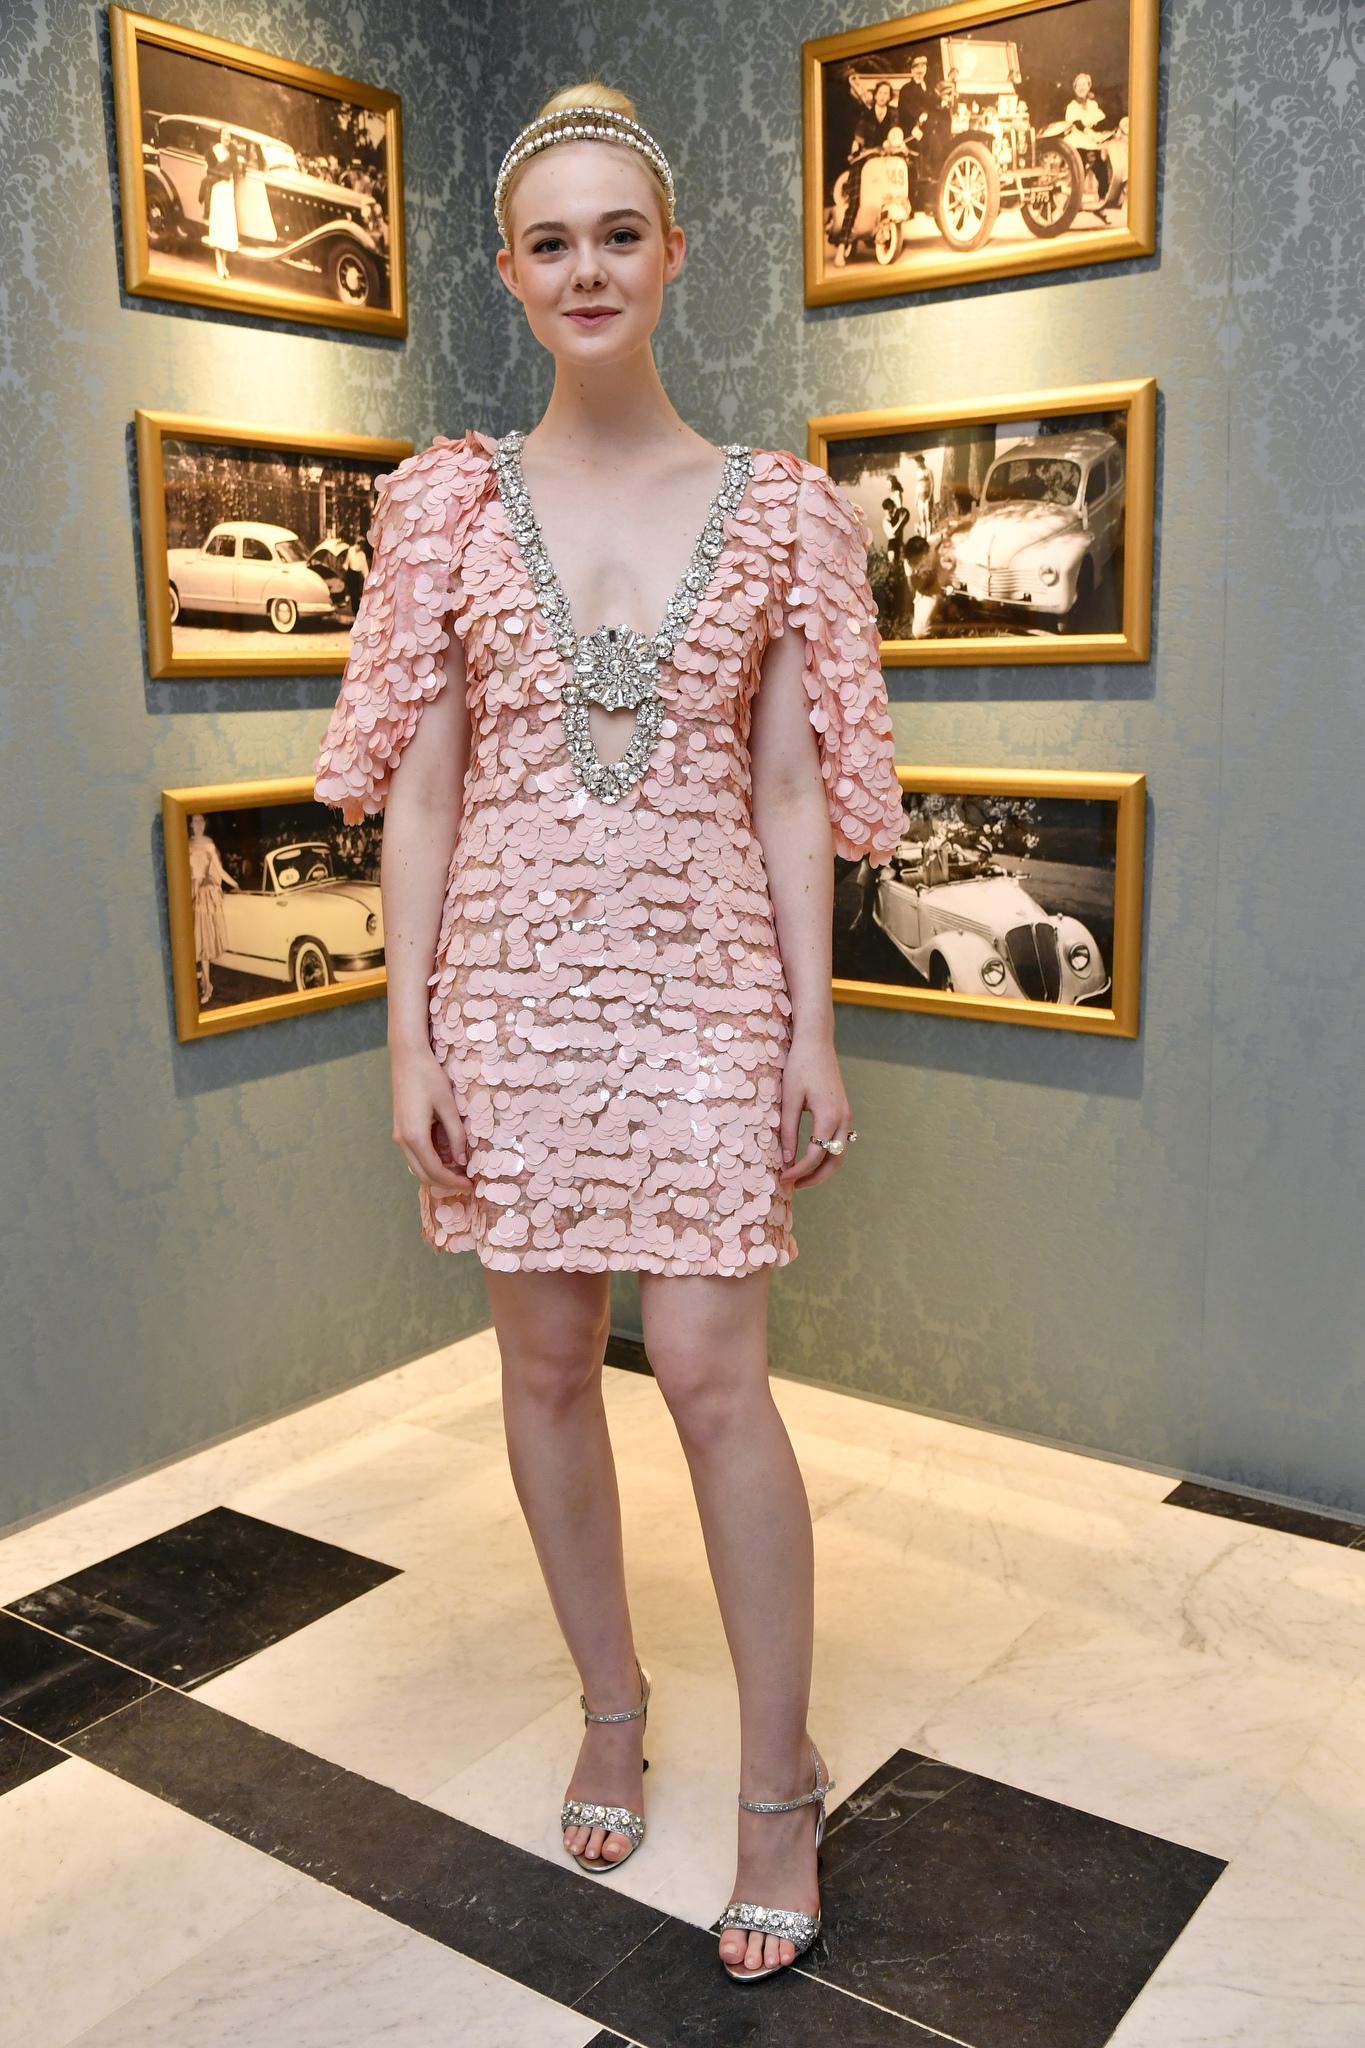 Elle FanningMiu Miu dinner, Fall Winter 2017, Haute Couture Fashion Week, Paris, France - 02 Jul 2017